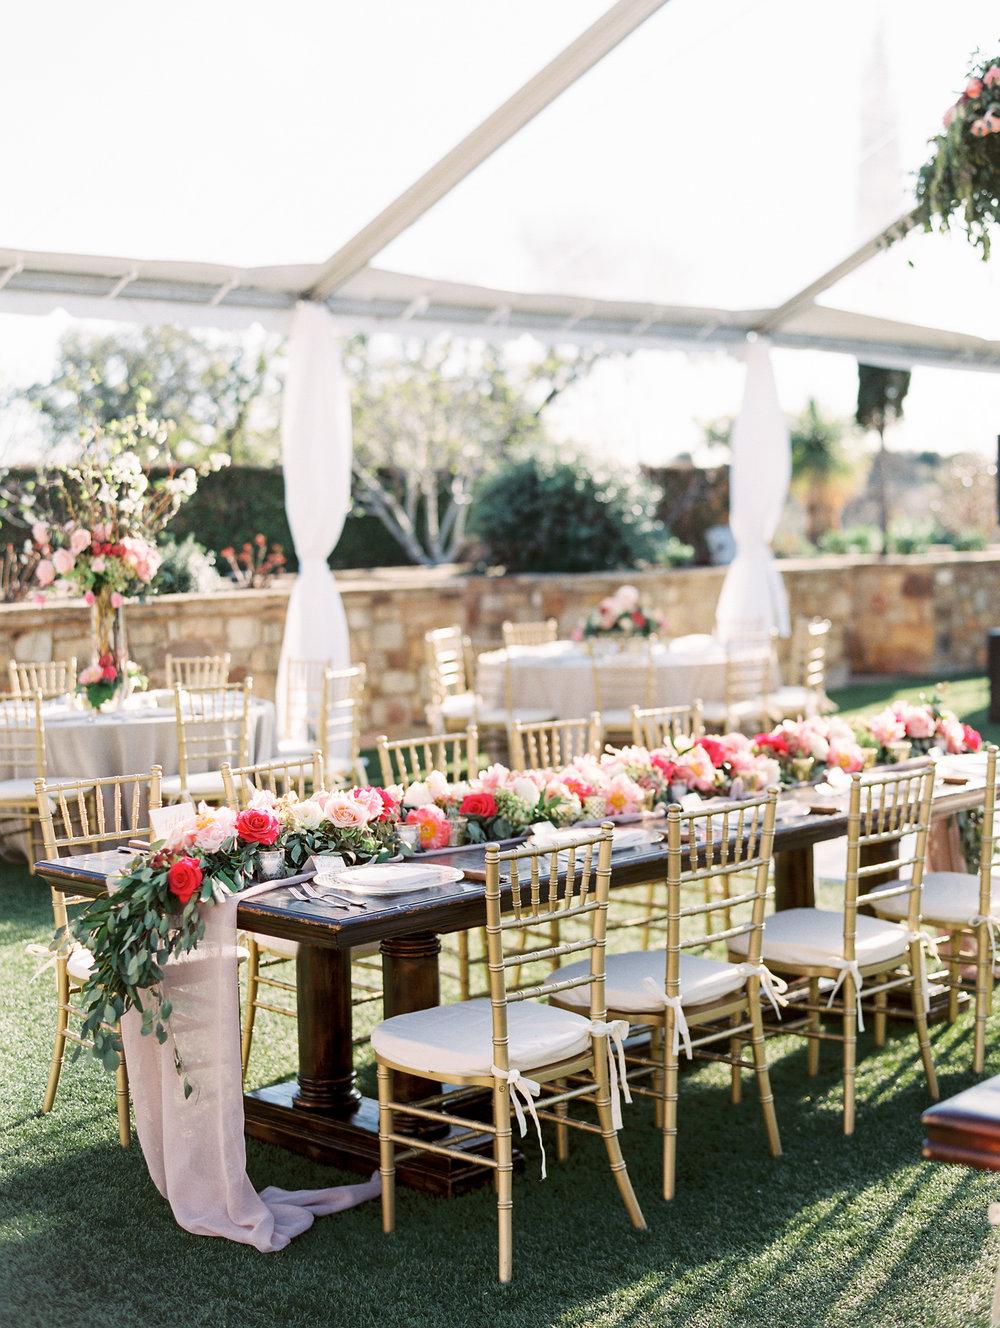 Escondido-Golf_Lake-Club-Hill-Country-Houston-Wedding-Photographer-Best-Top-Luxury-Destination-Engagements-Portrait-Austin-Photography-124.jpg